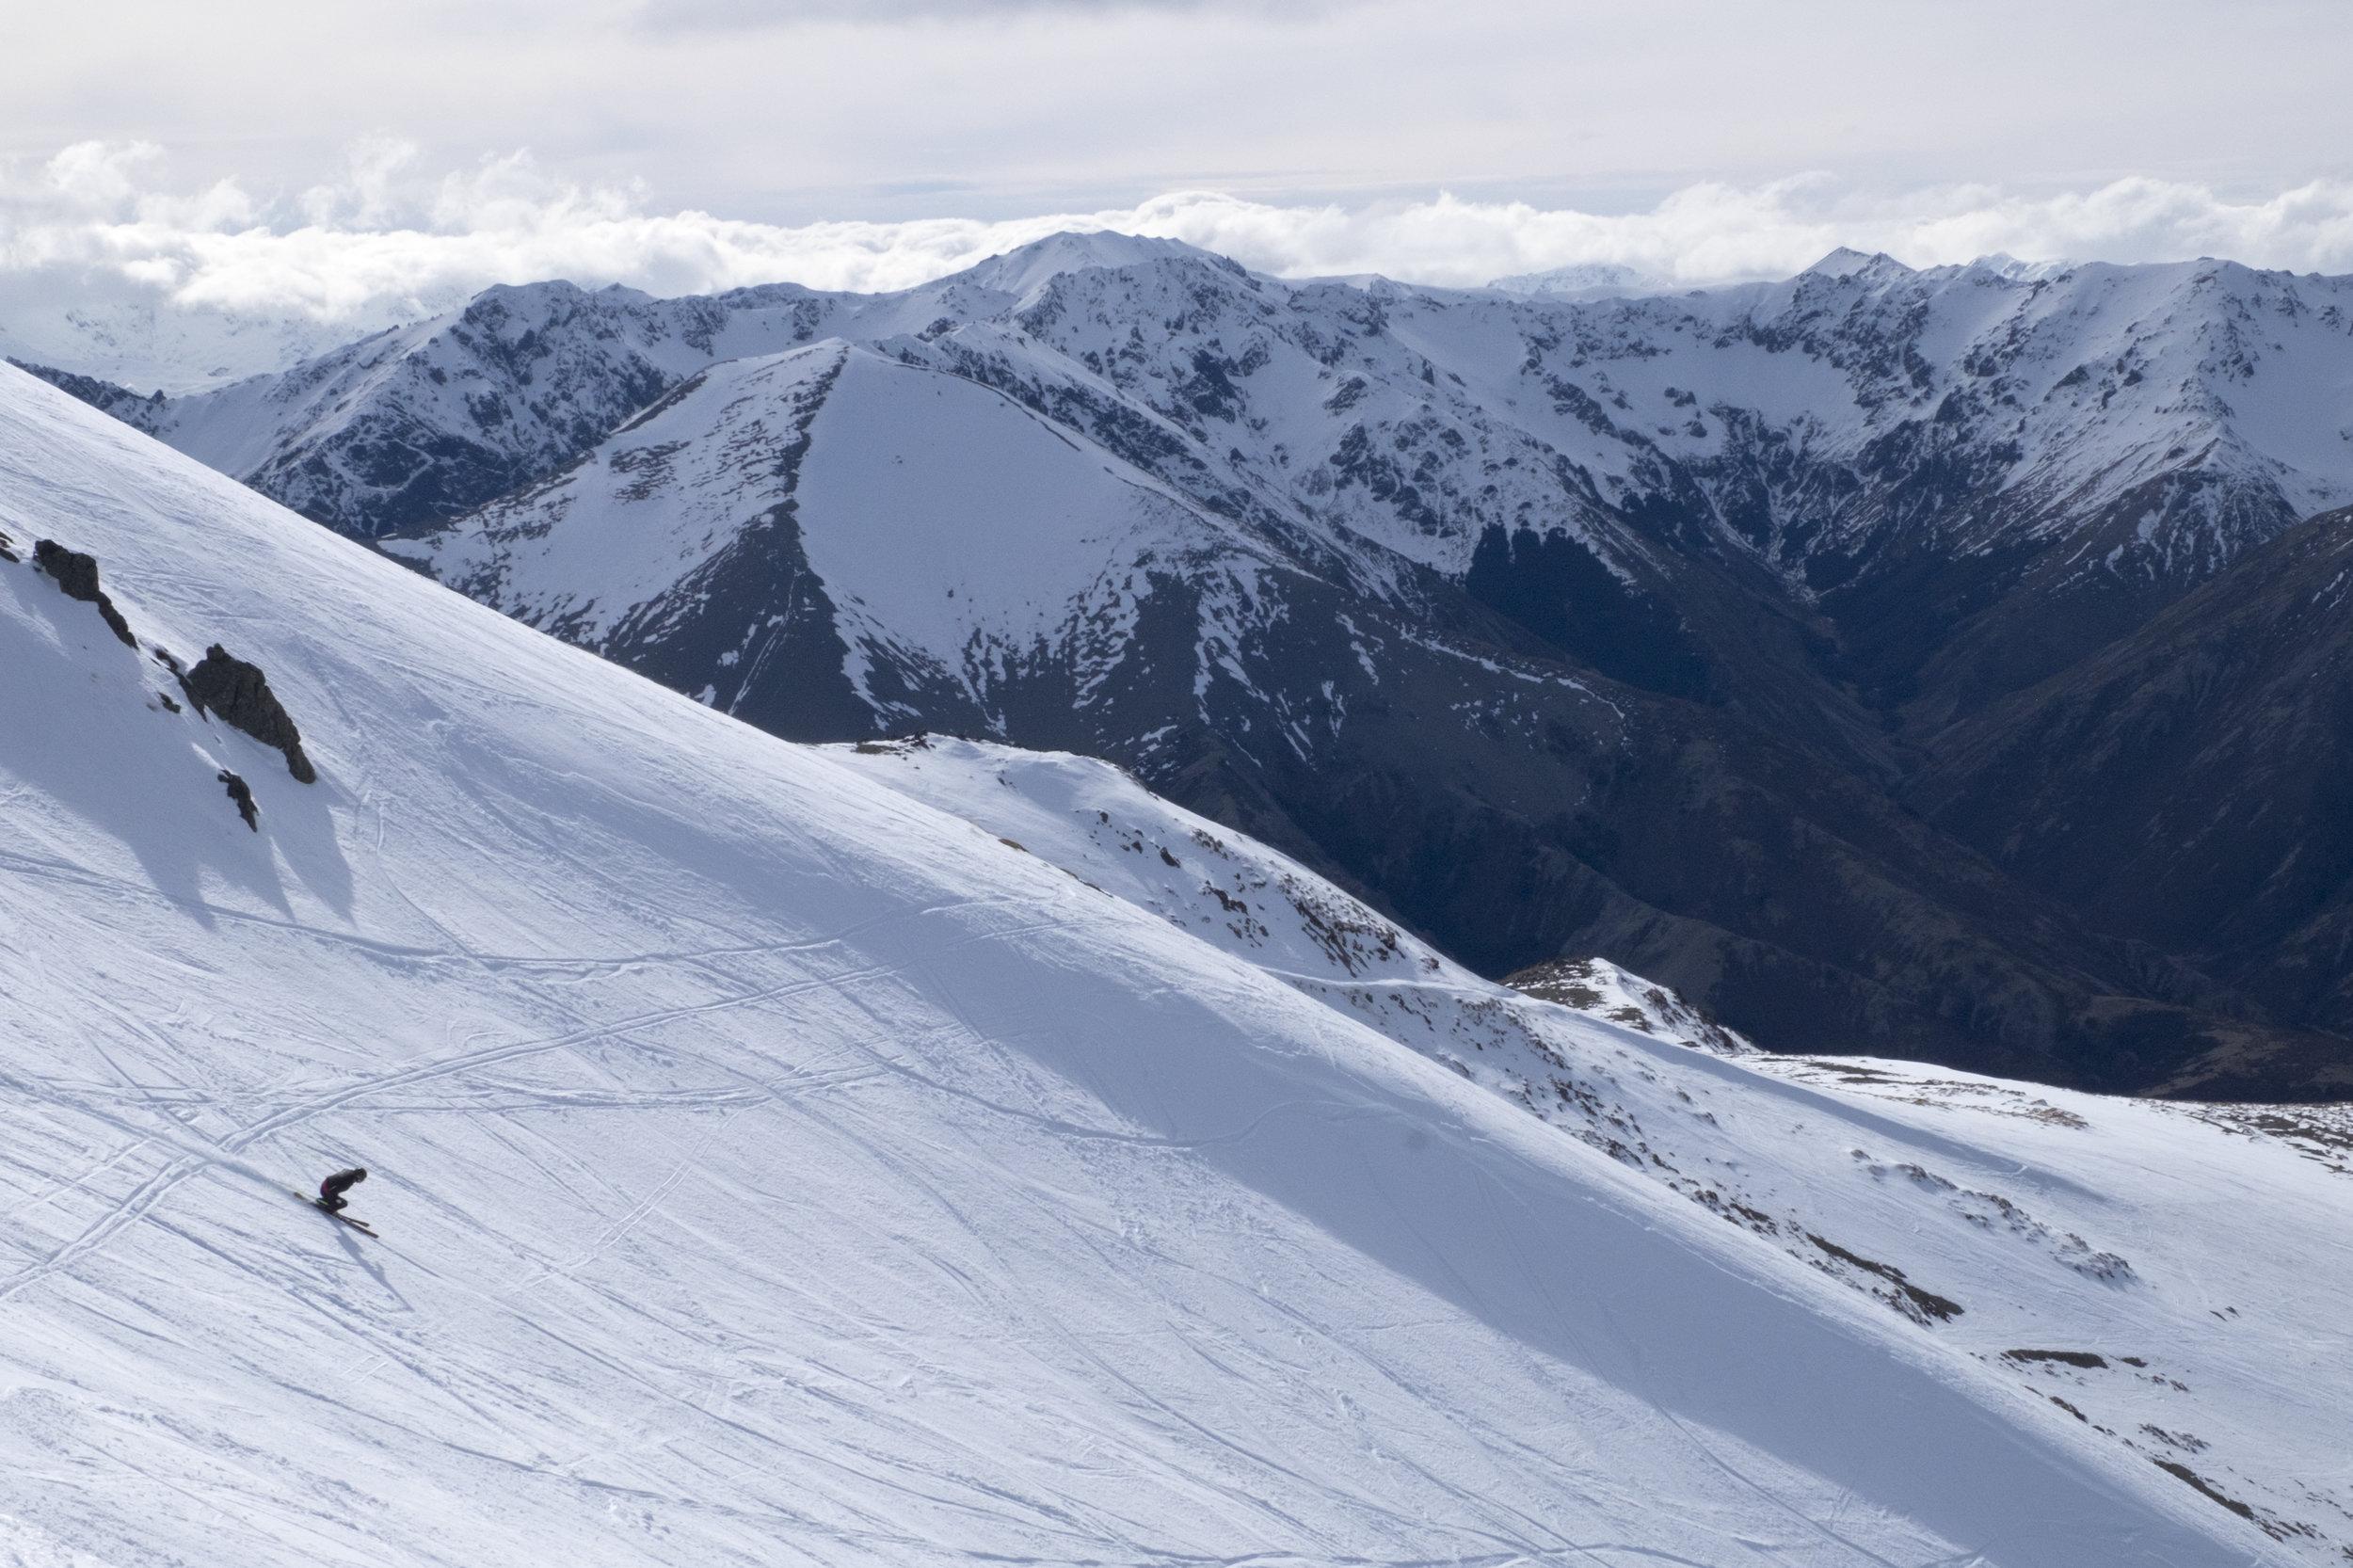 Ski Area Terrain - 10% Beginner / 60% Intermediate / 30% AdvancedLIFTS: 1 Poma Lift (807 m)/1 rope tow / 1 fixed grip learners towELEVATION: 1769 mVERTICAL: 310 mIN BOUNDS SKI TERRAIN: 52 haTERRAIN PARK: one big natural park! Get amongst!